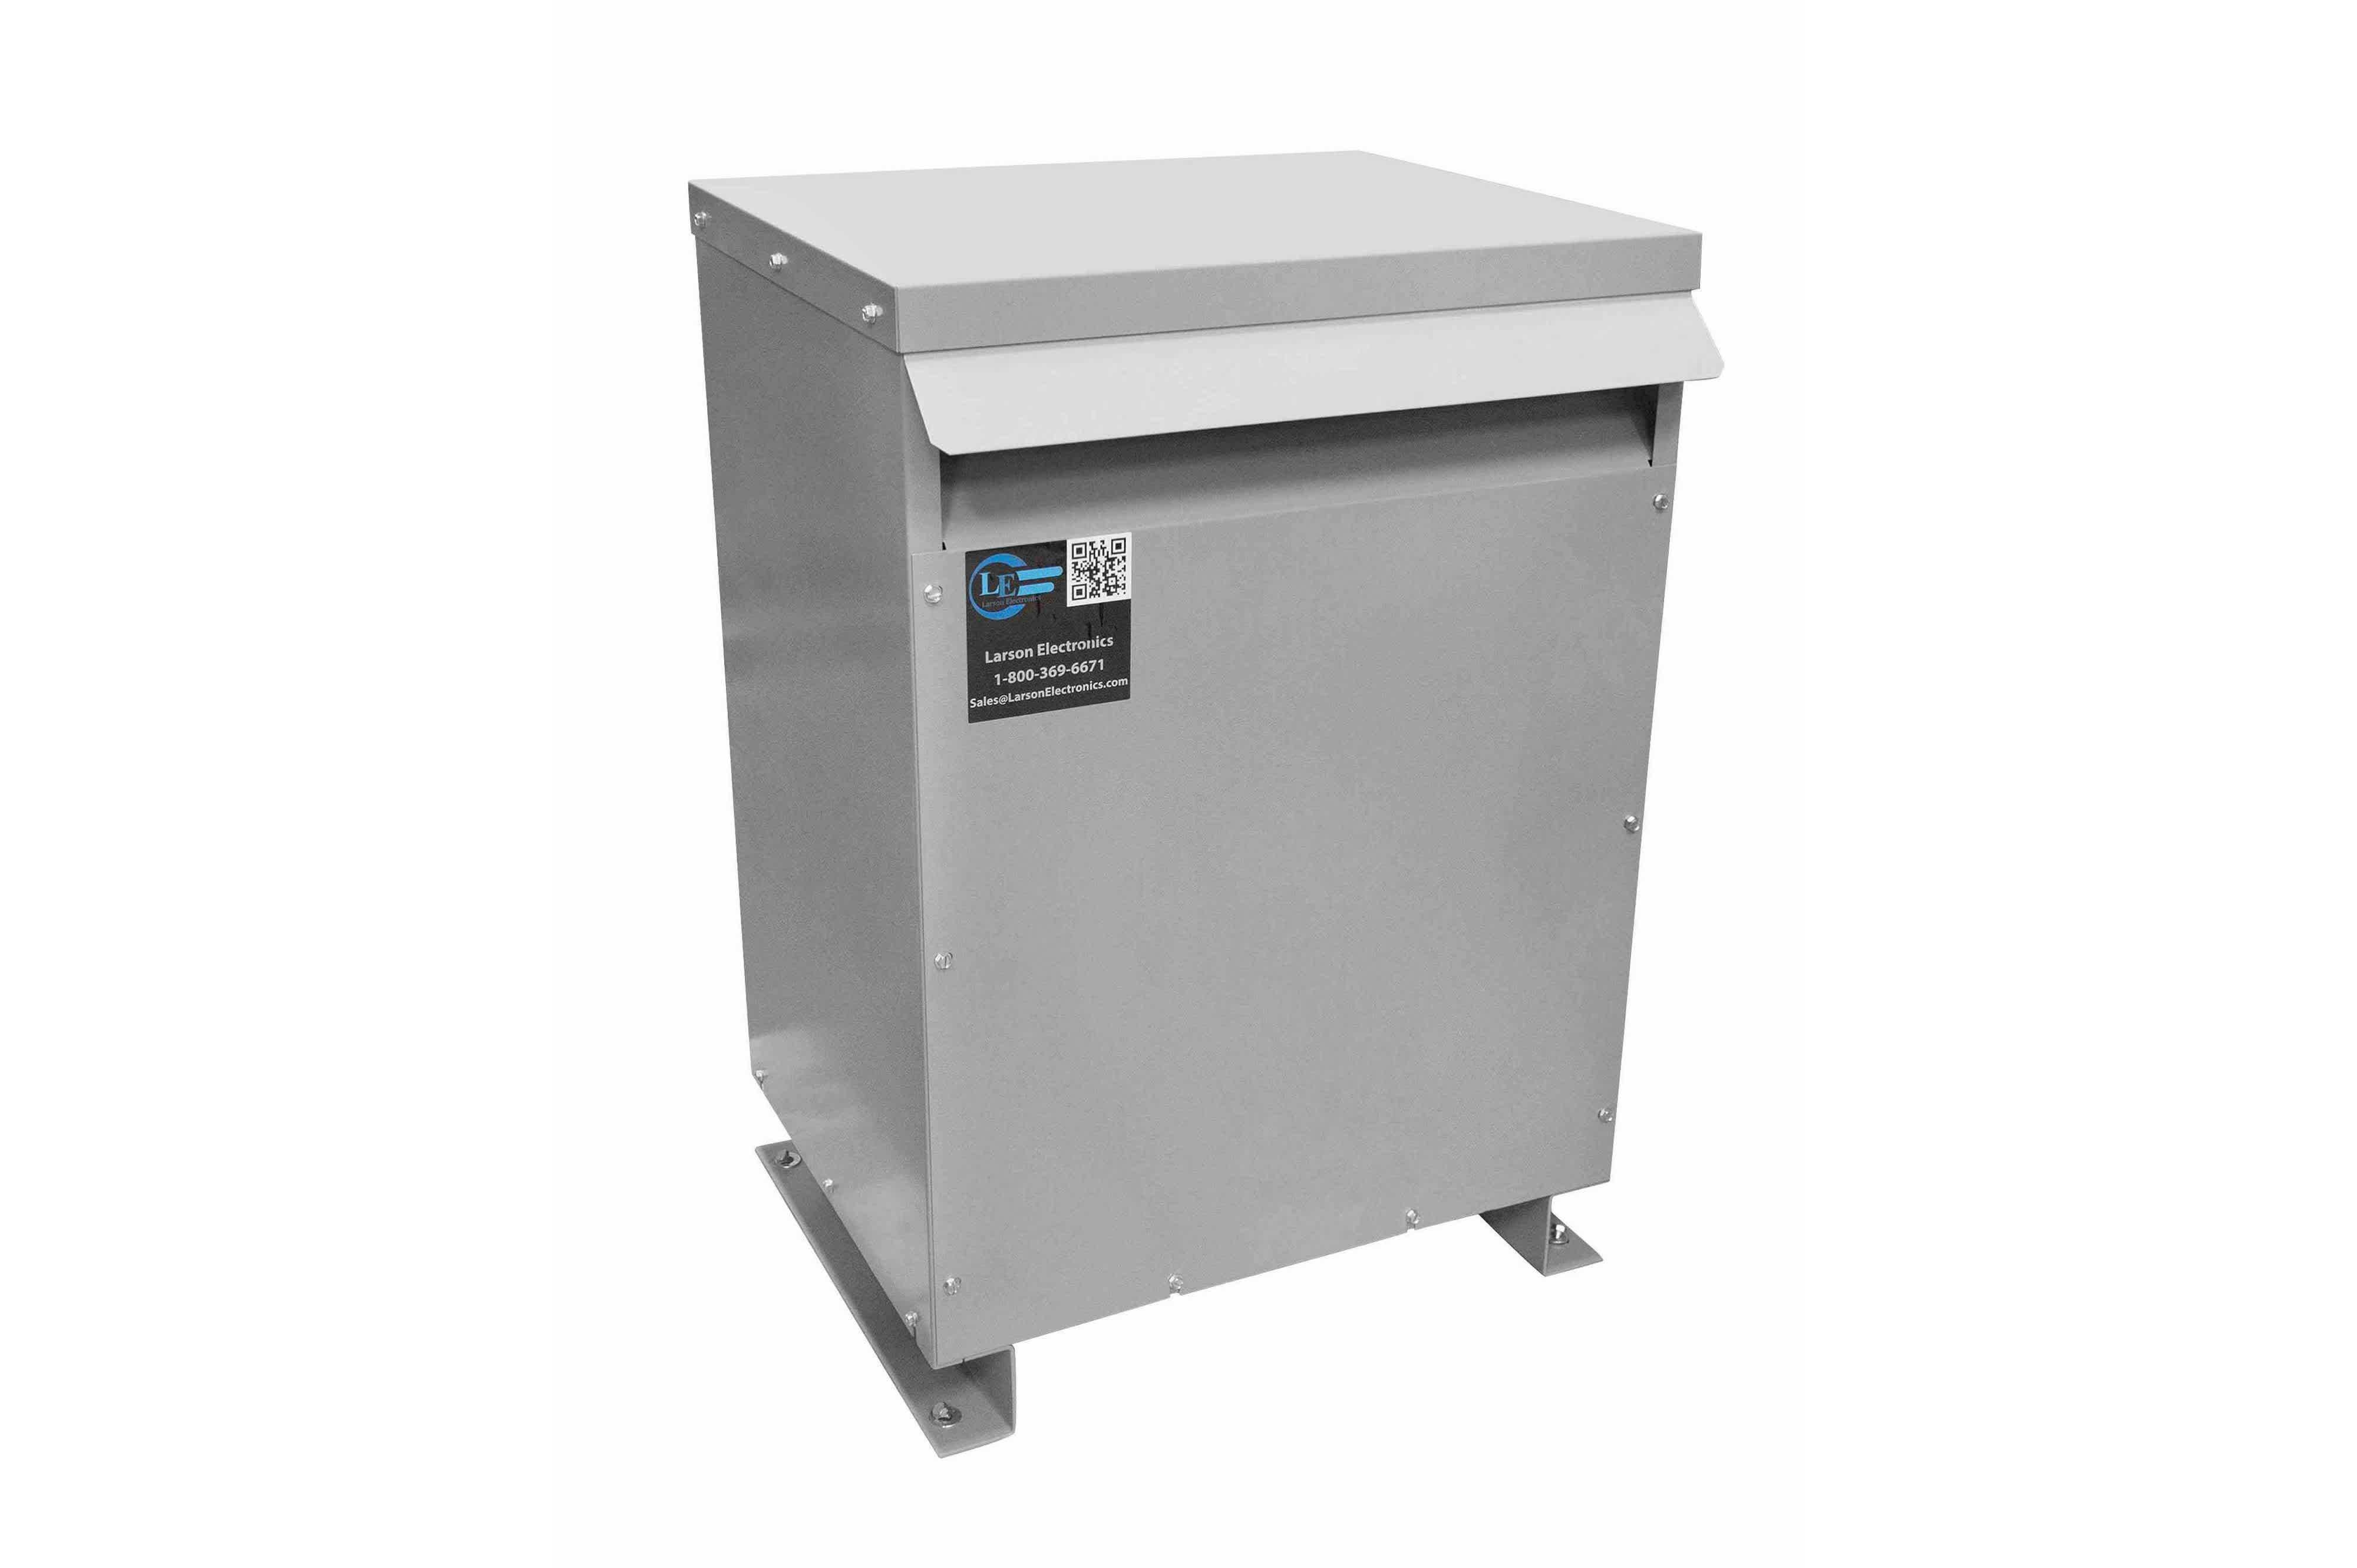 36 kVA 3PH Isolation Transformer, 600V Wye Primary, 415V Delta Secondary, N3R, Ventilated, 60 Hz